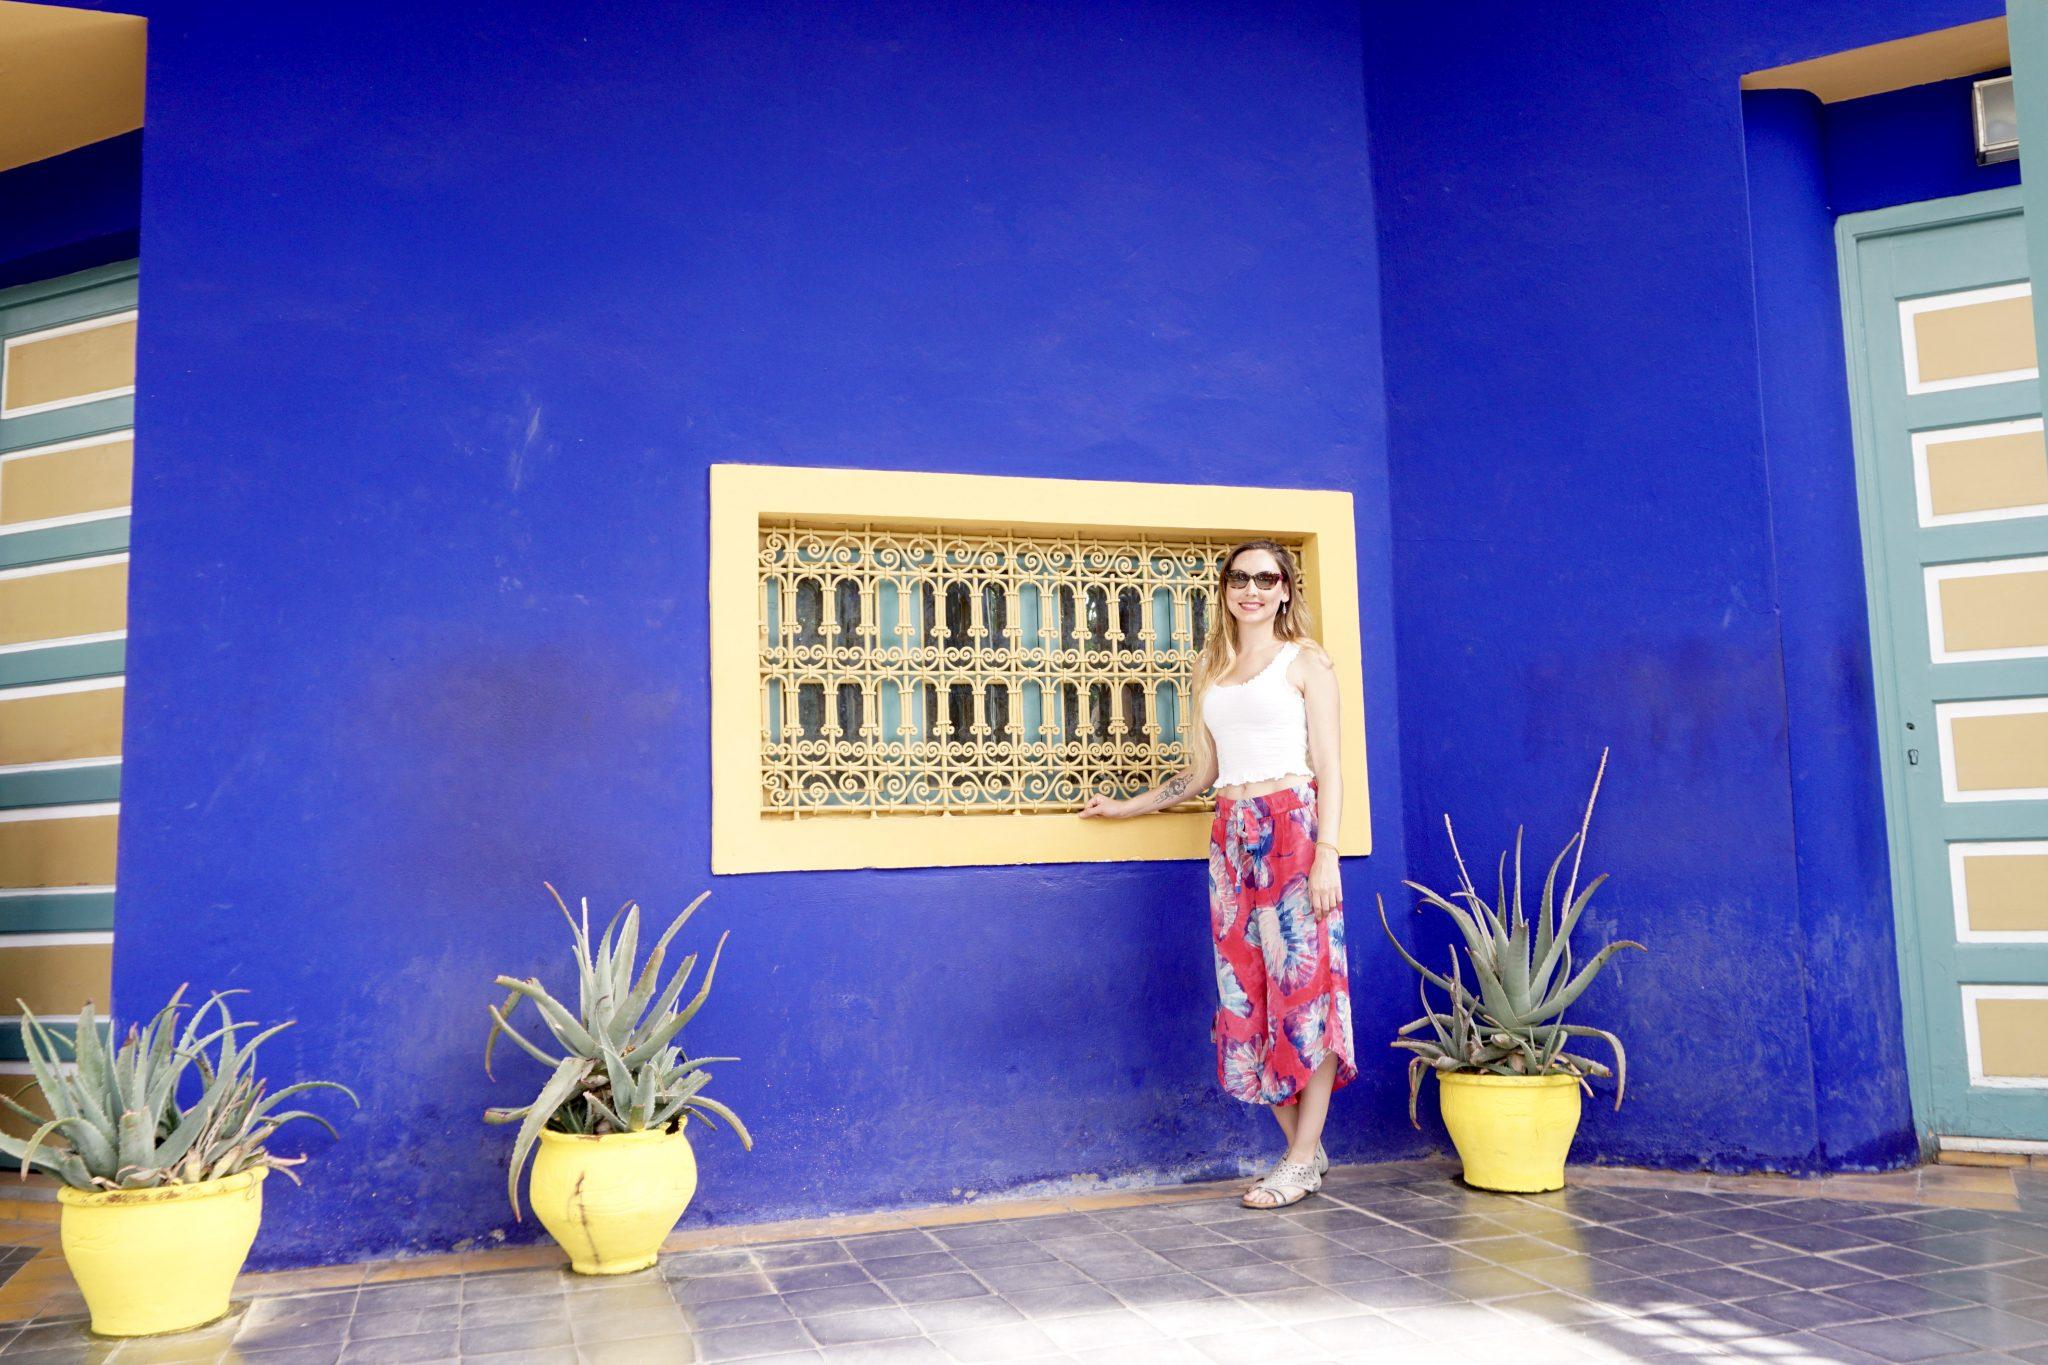 marjorelle gardens, marrakech, blue